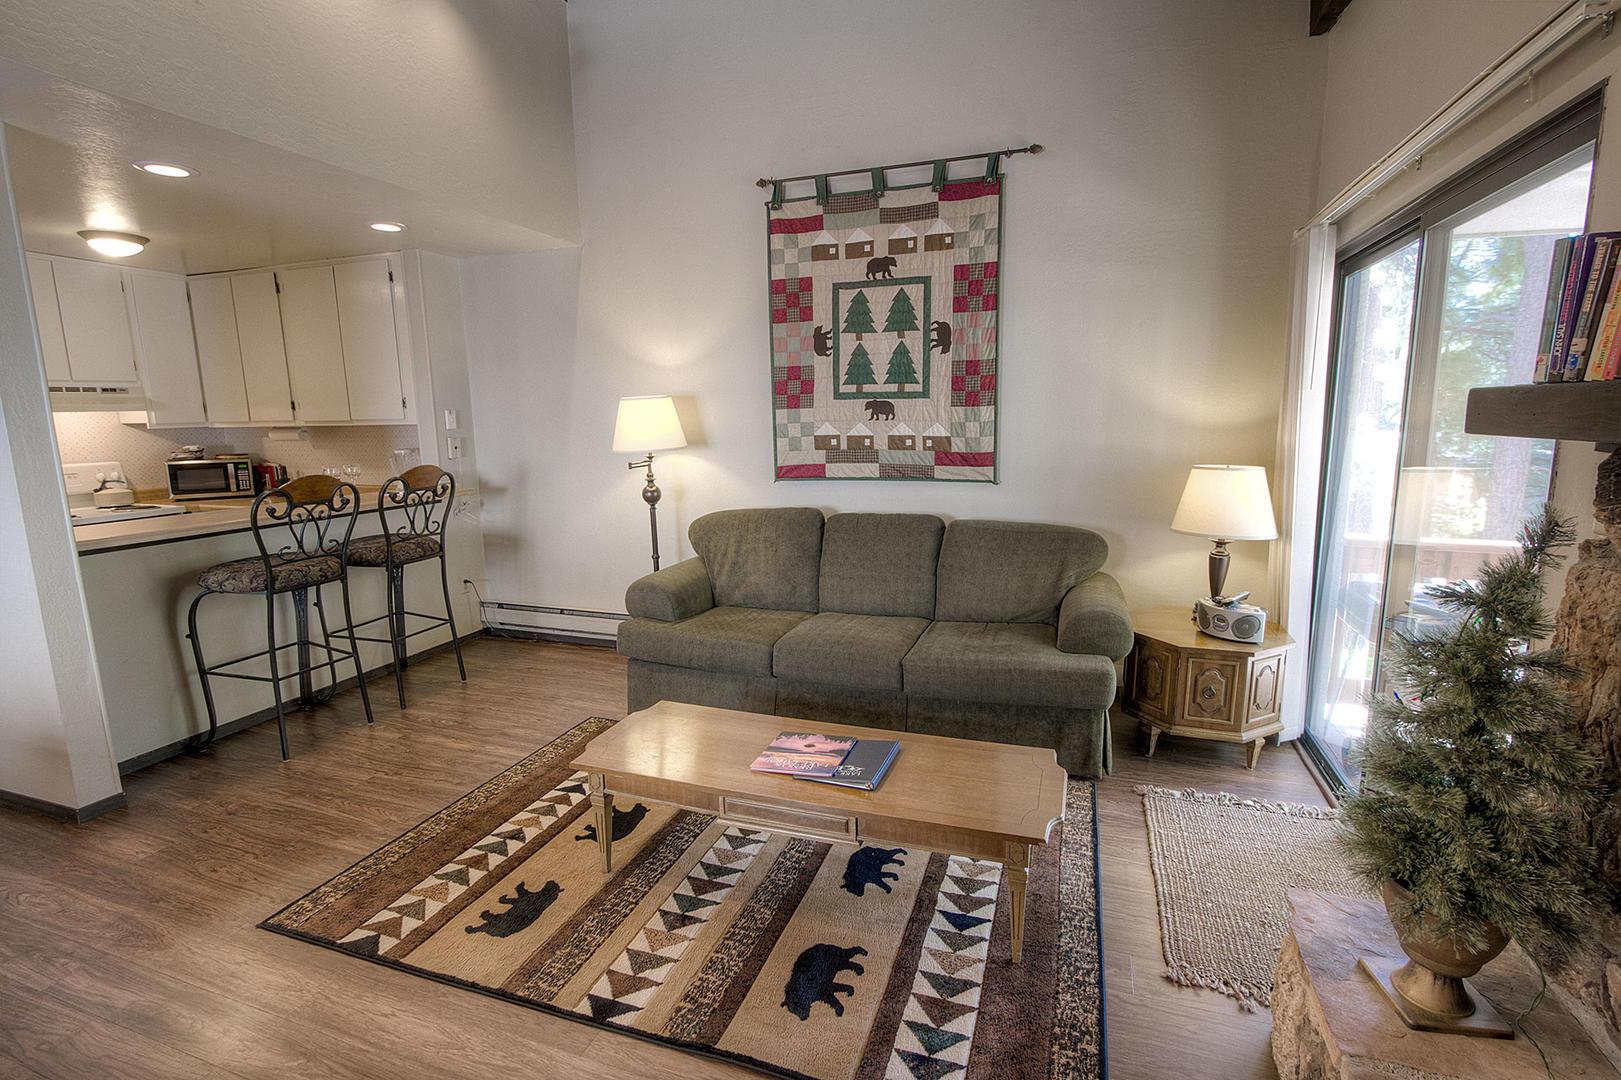 wdc0660 Living room